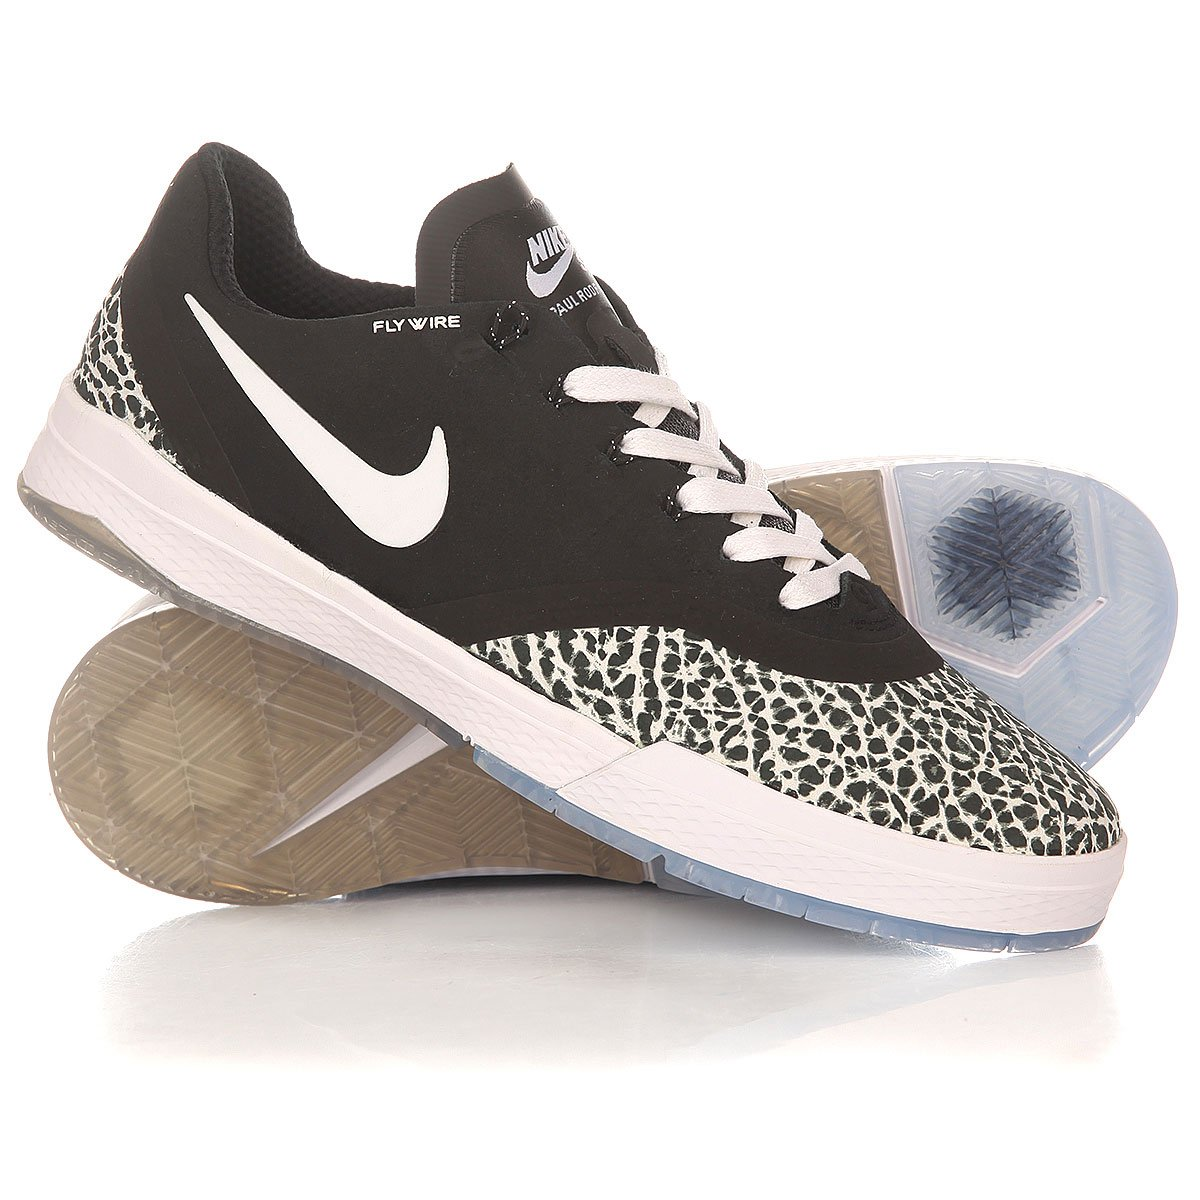 cde3ab83 Купить кеды низкие Nike Paul Rodriguez 9 Elite T Black/White (833902 ...